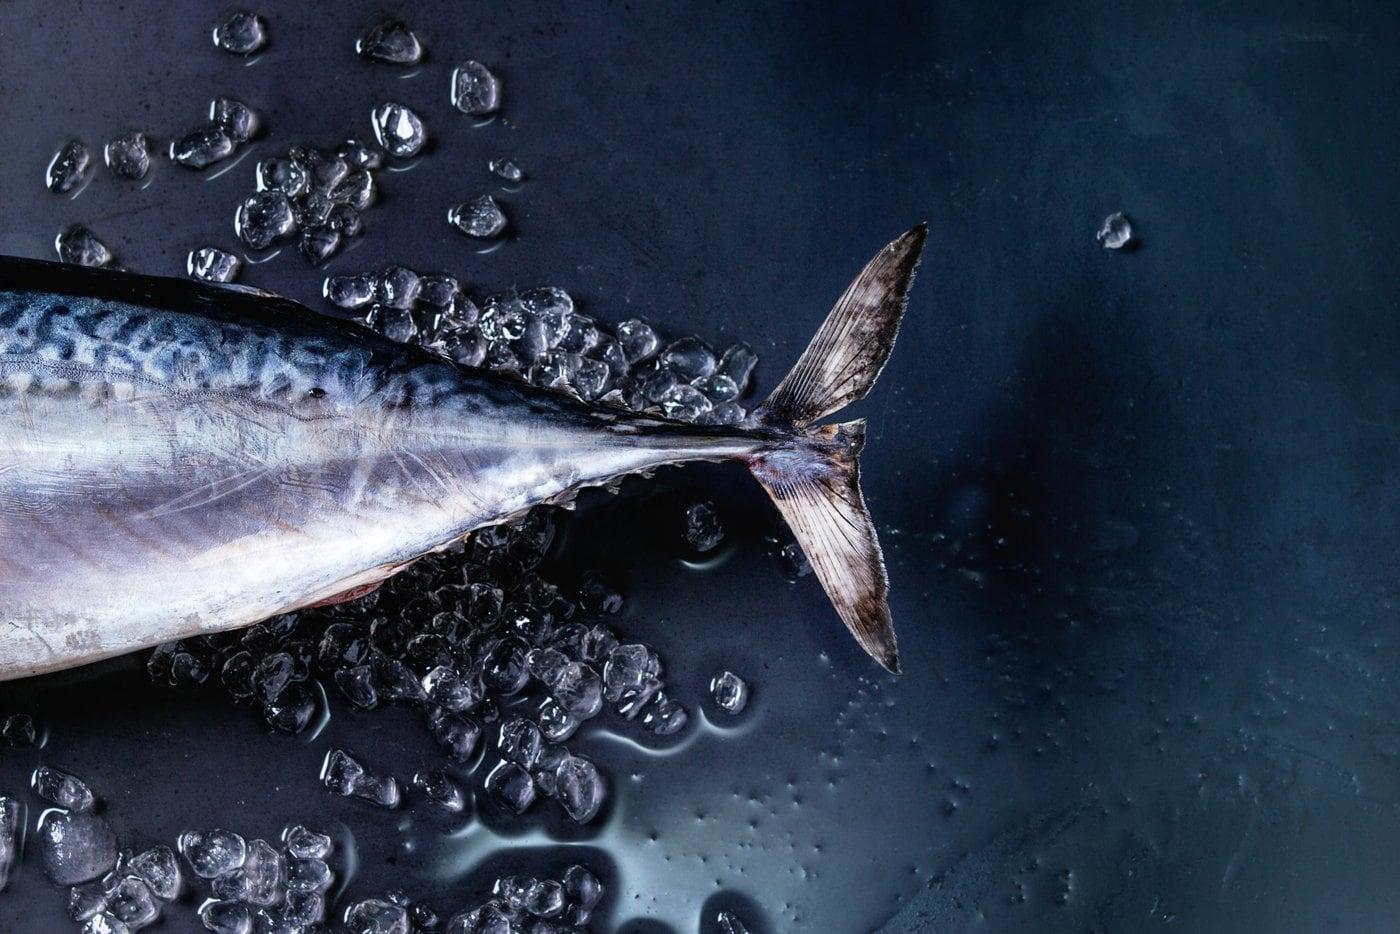 Tail of a fresh raw tuna fish